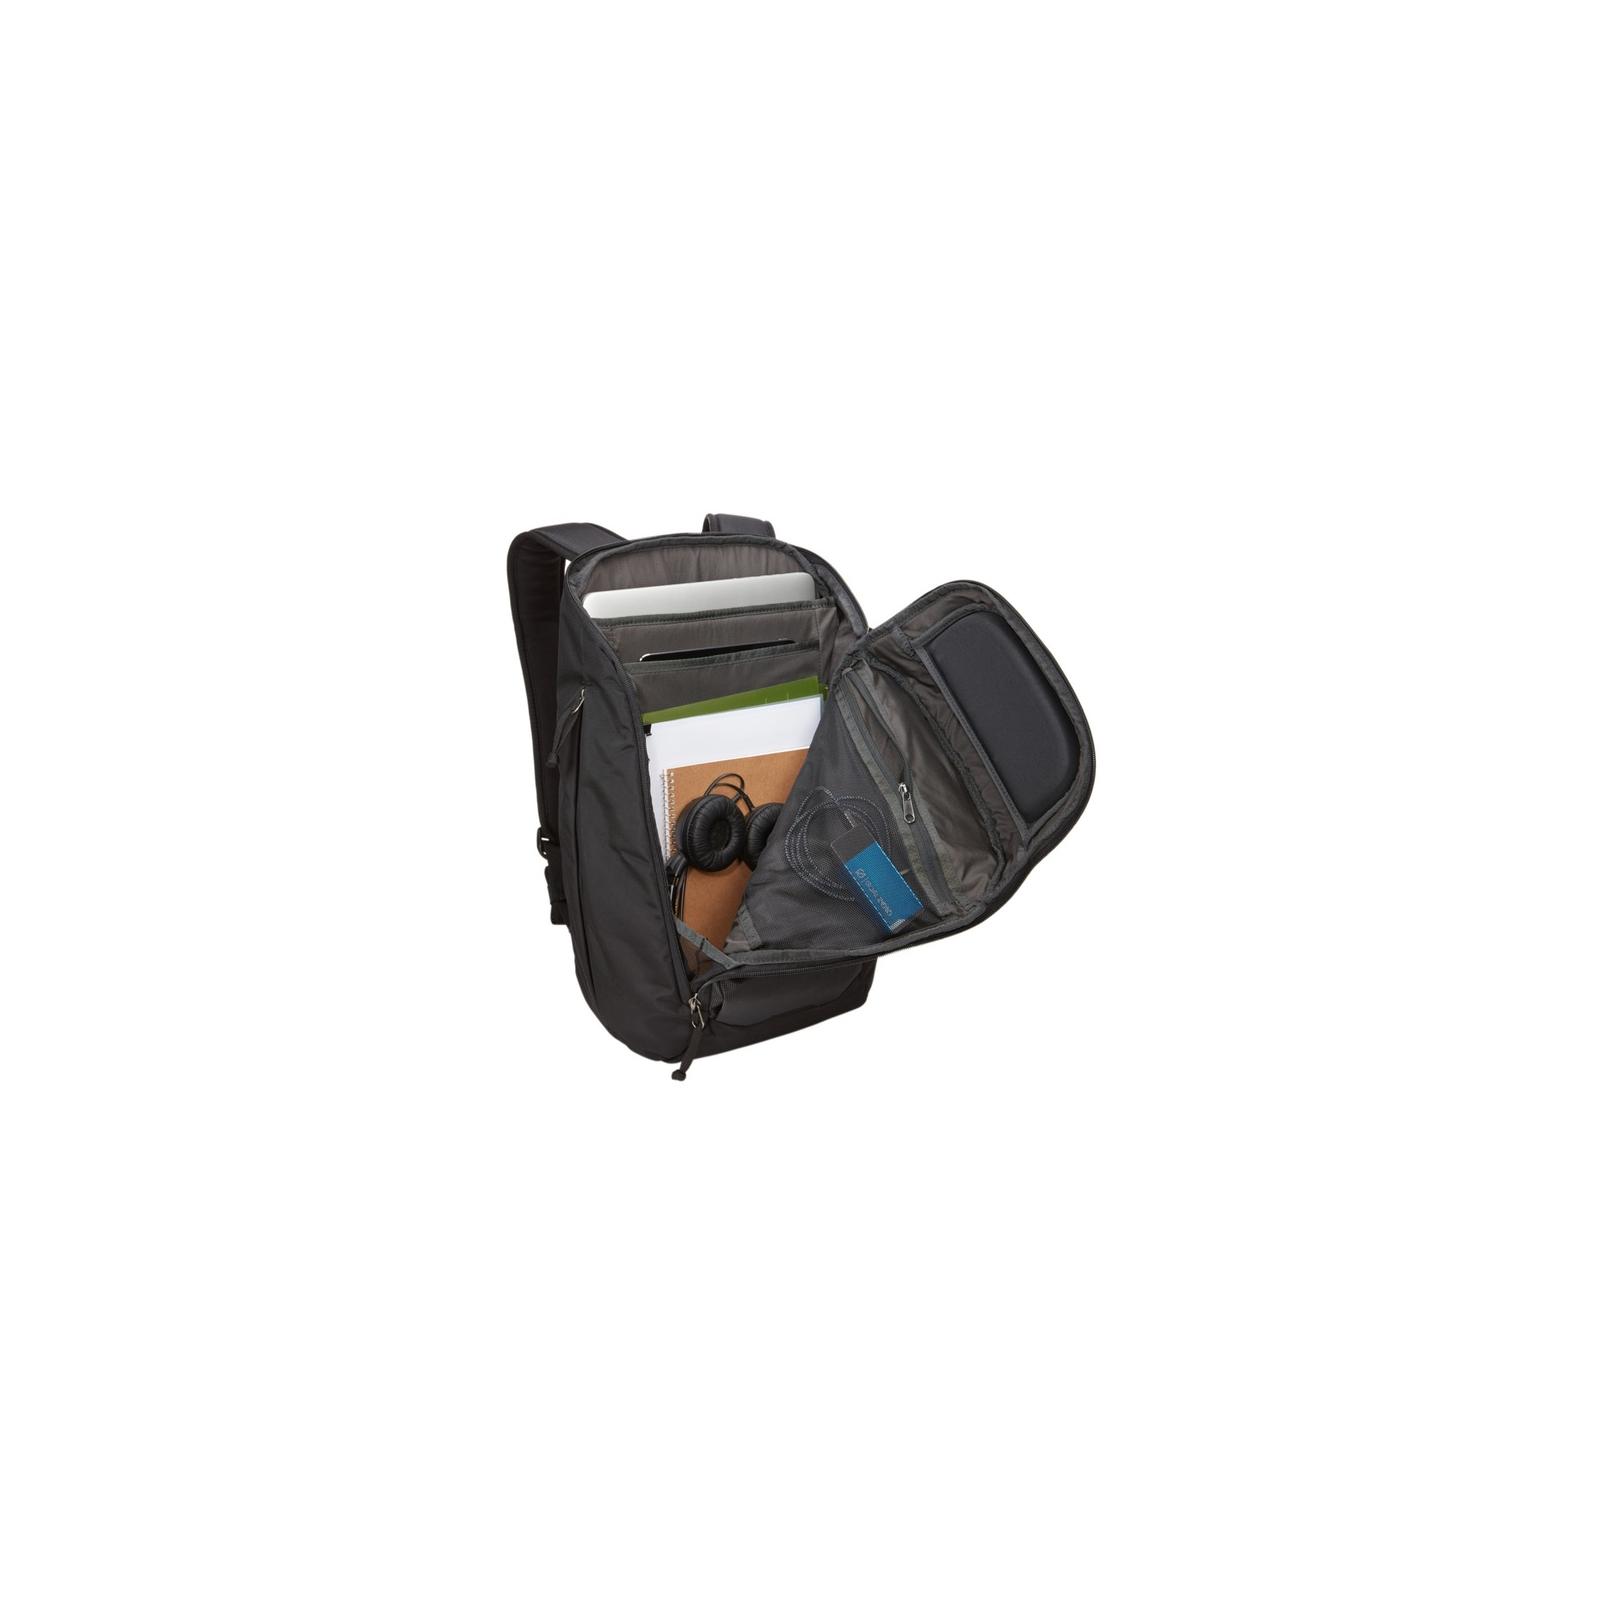 "Рюкзак для ноутбука Thule 15.6"" EnRoute 23L TEBP-316 Asphalt (3203830) изображение 6"